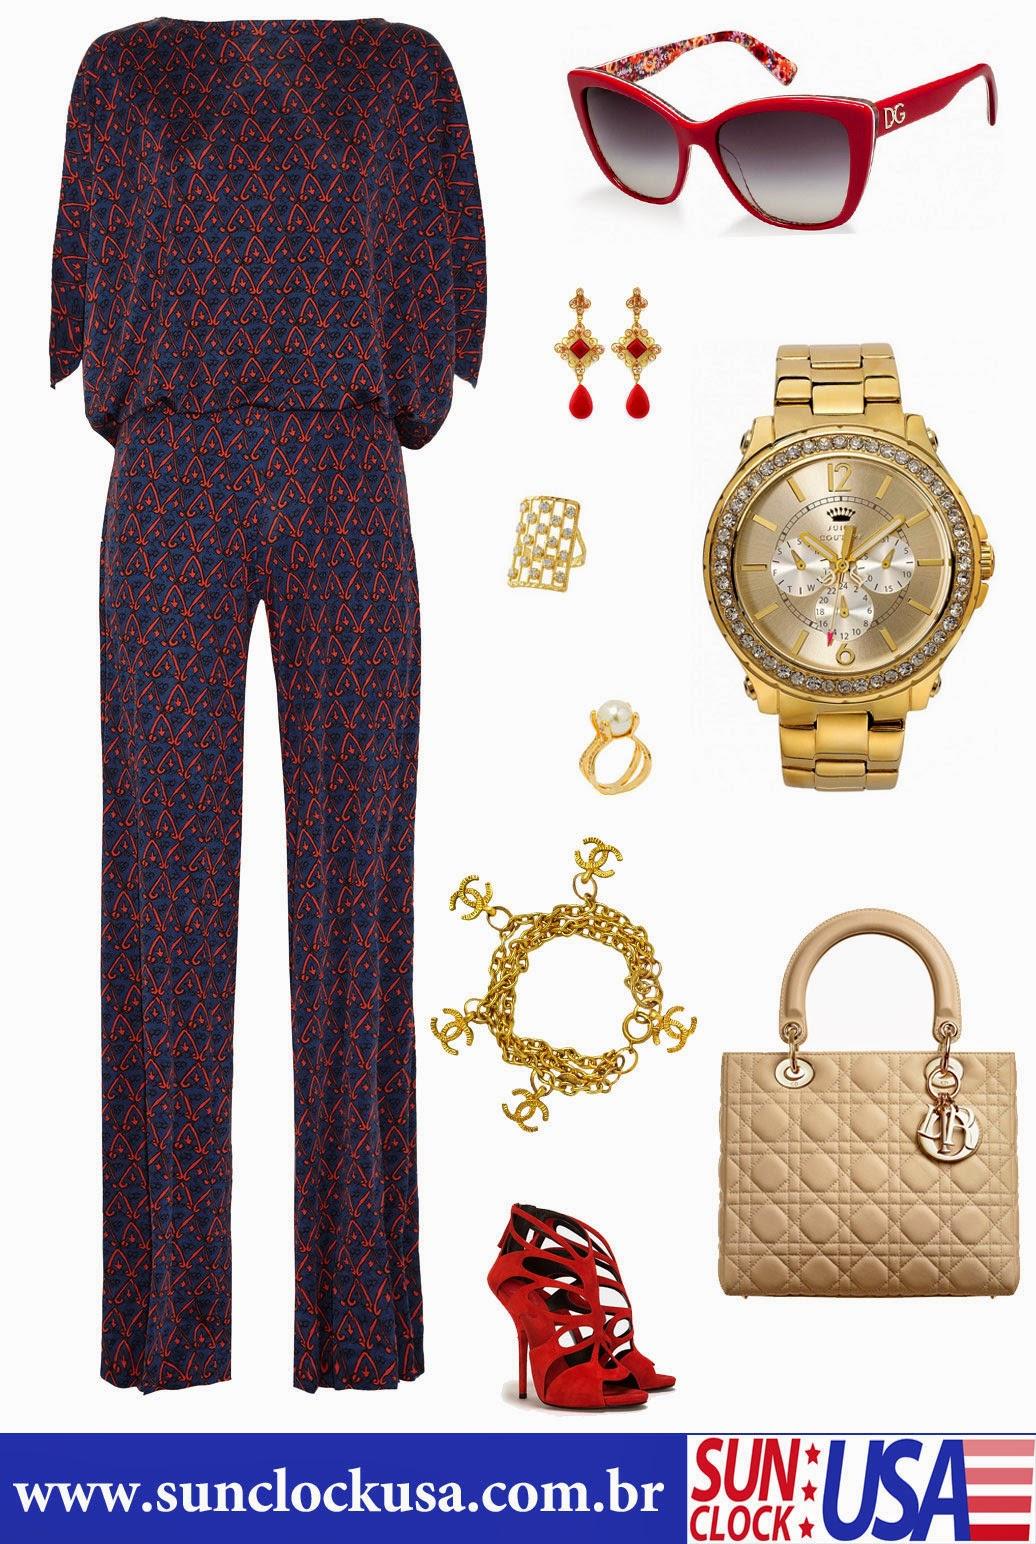 Relógios Juicy Couture e Óculos Dolce & Gabbana